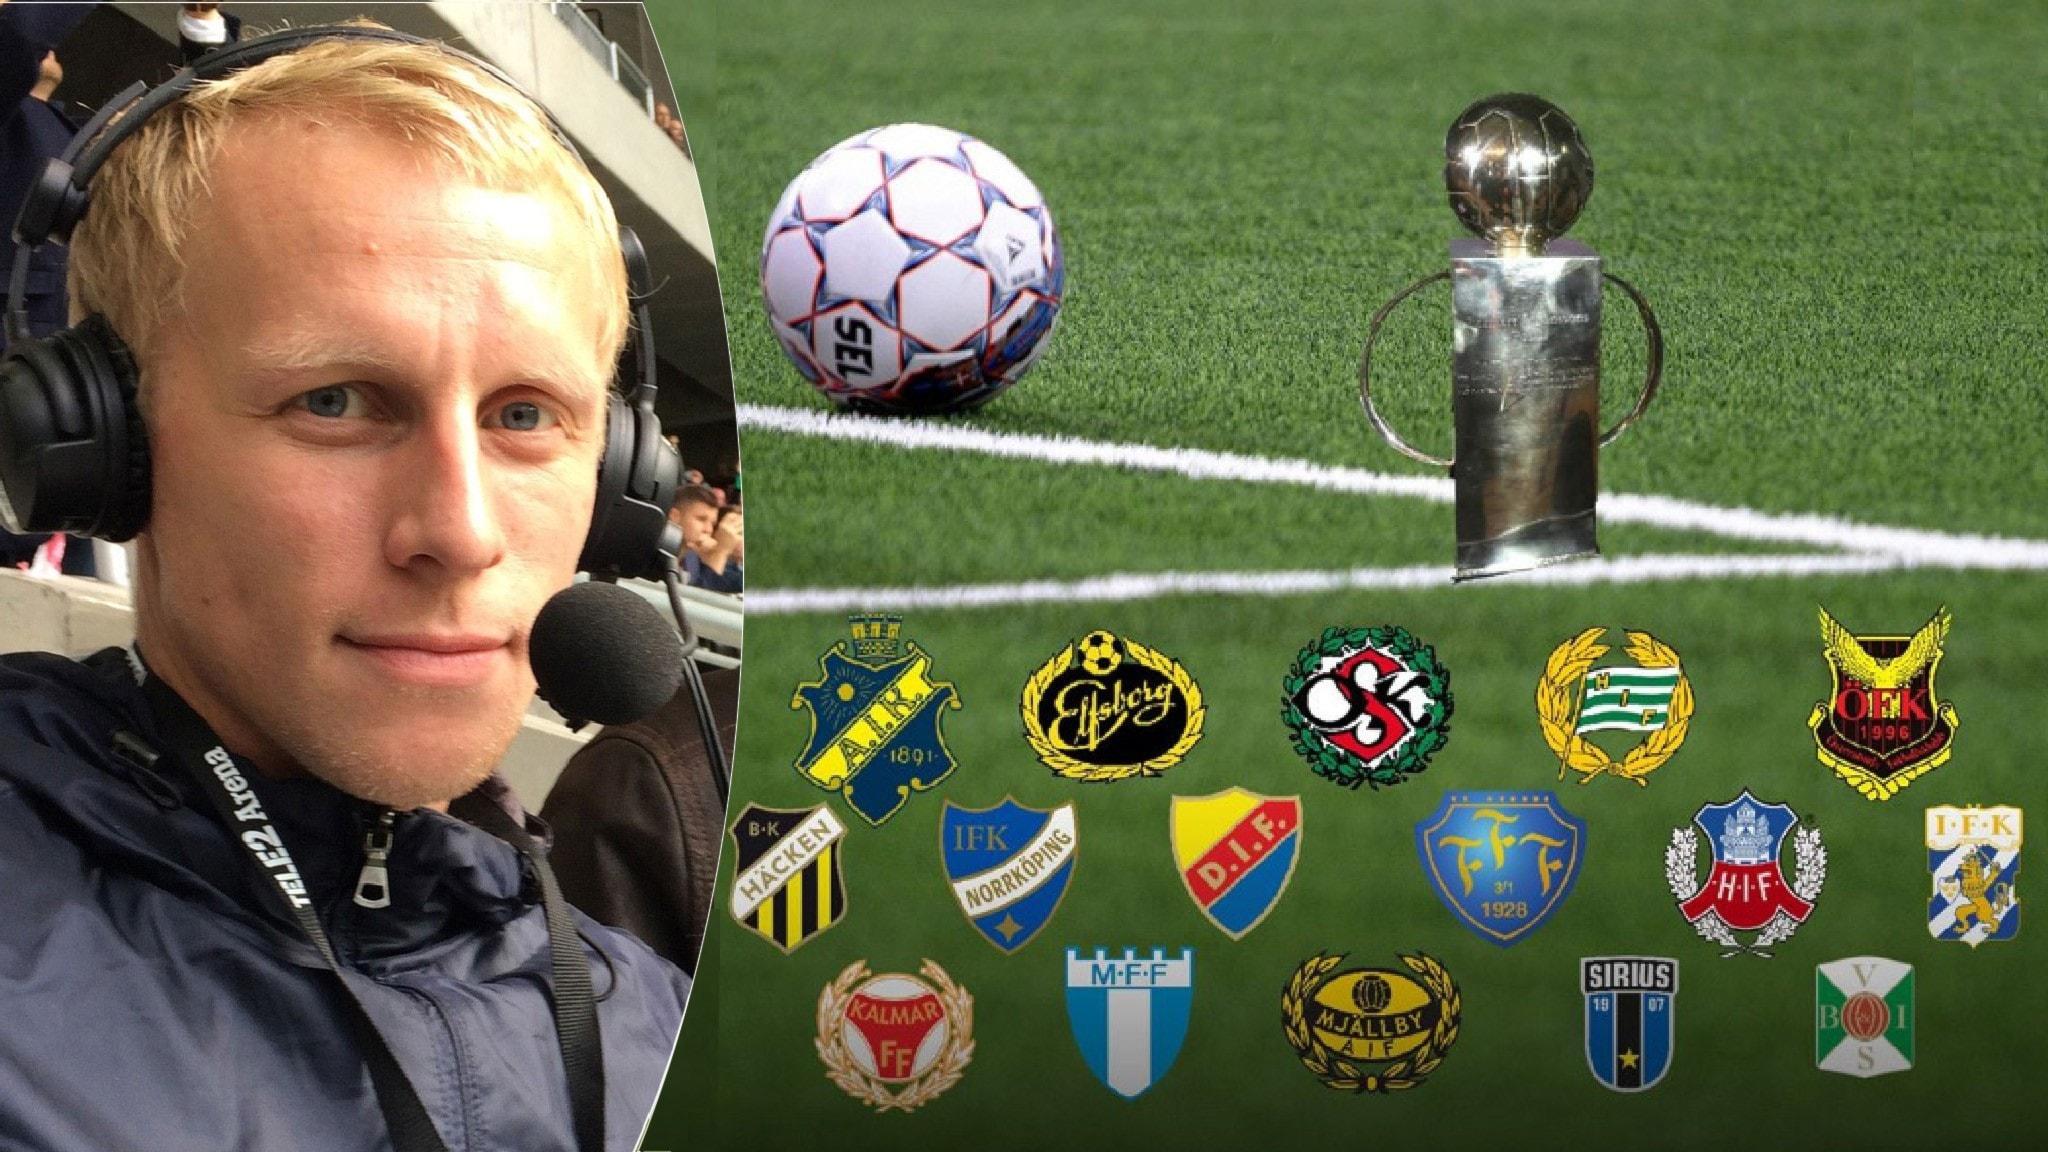 Radiosportens fotbollsexpert Richard Henriksson